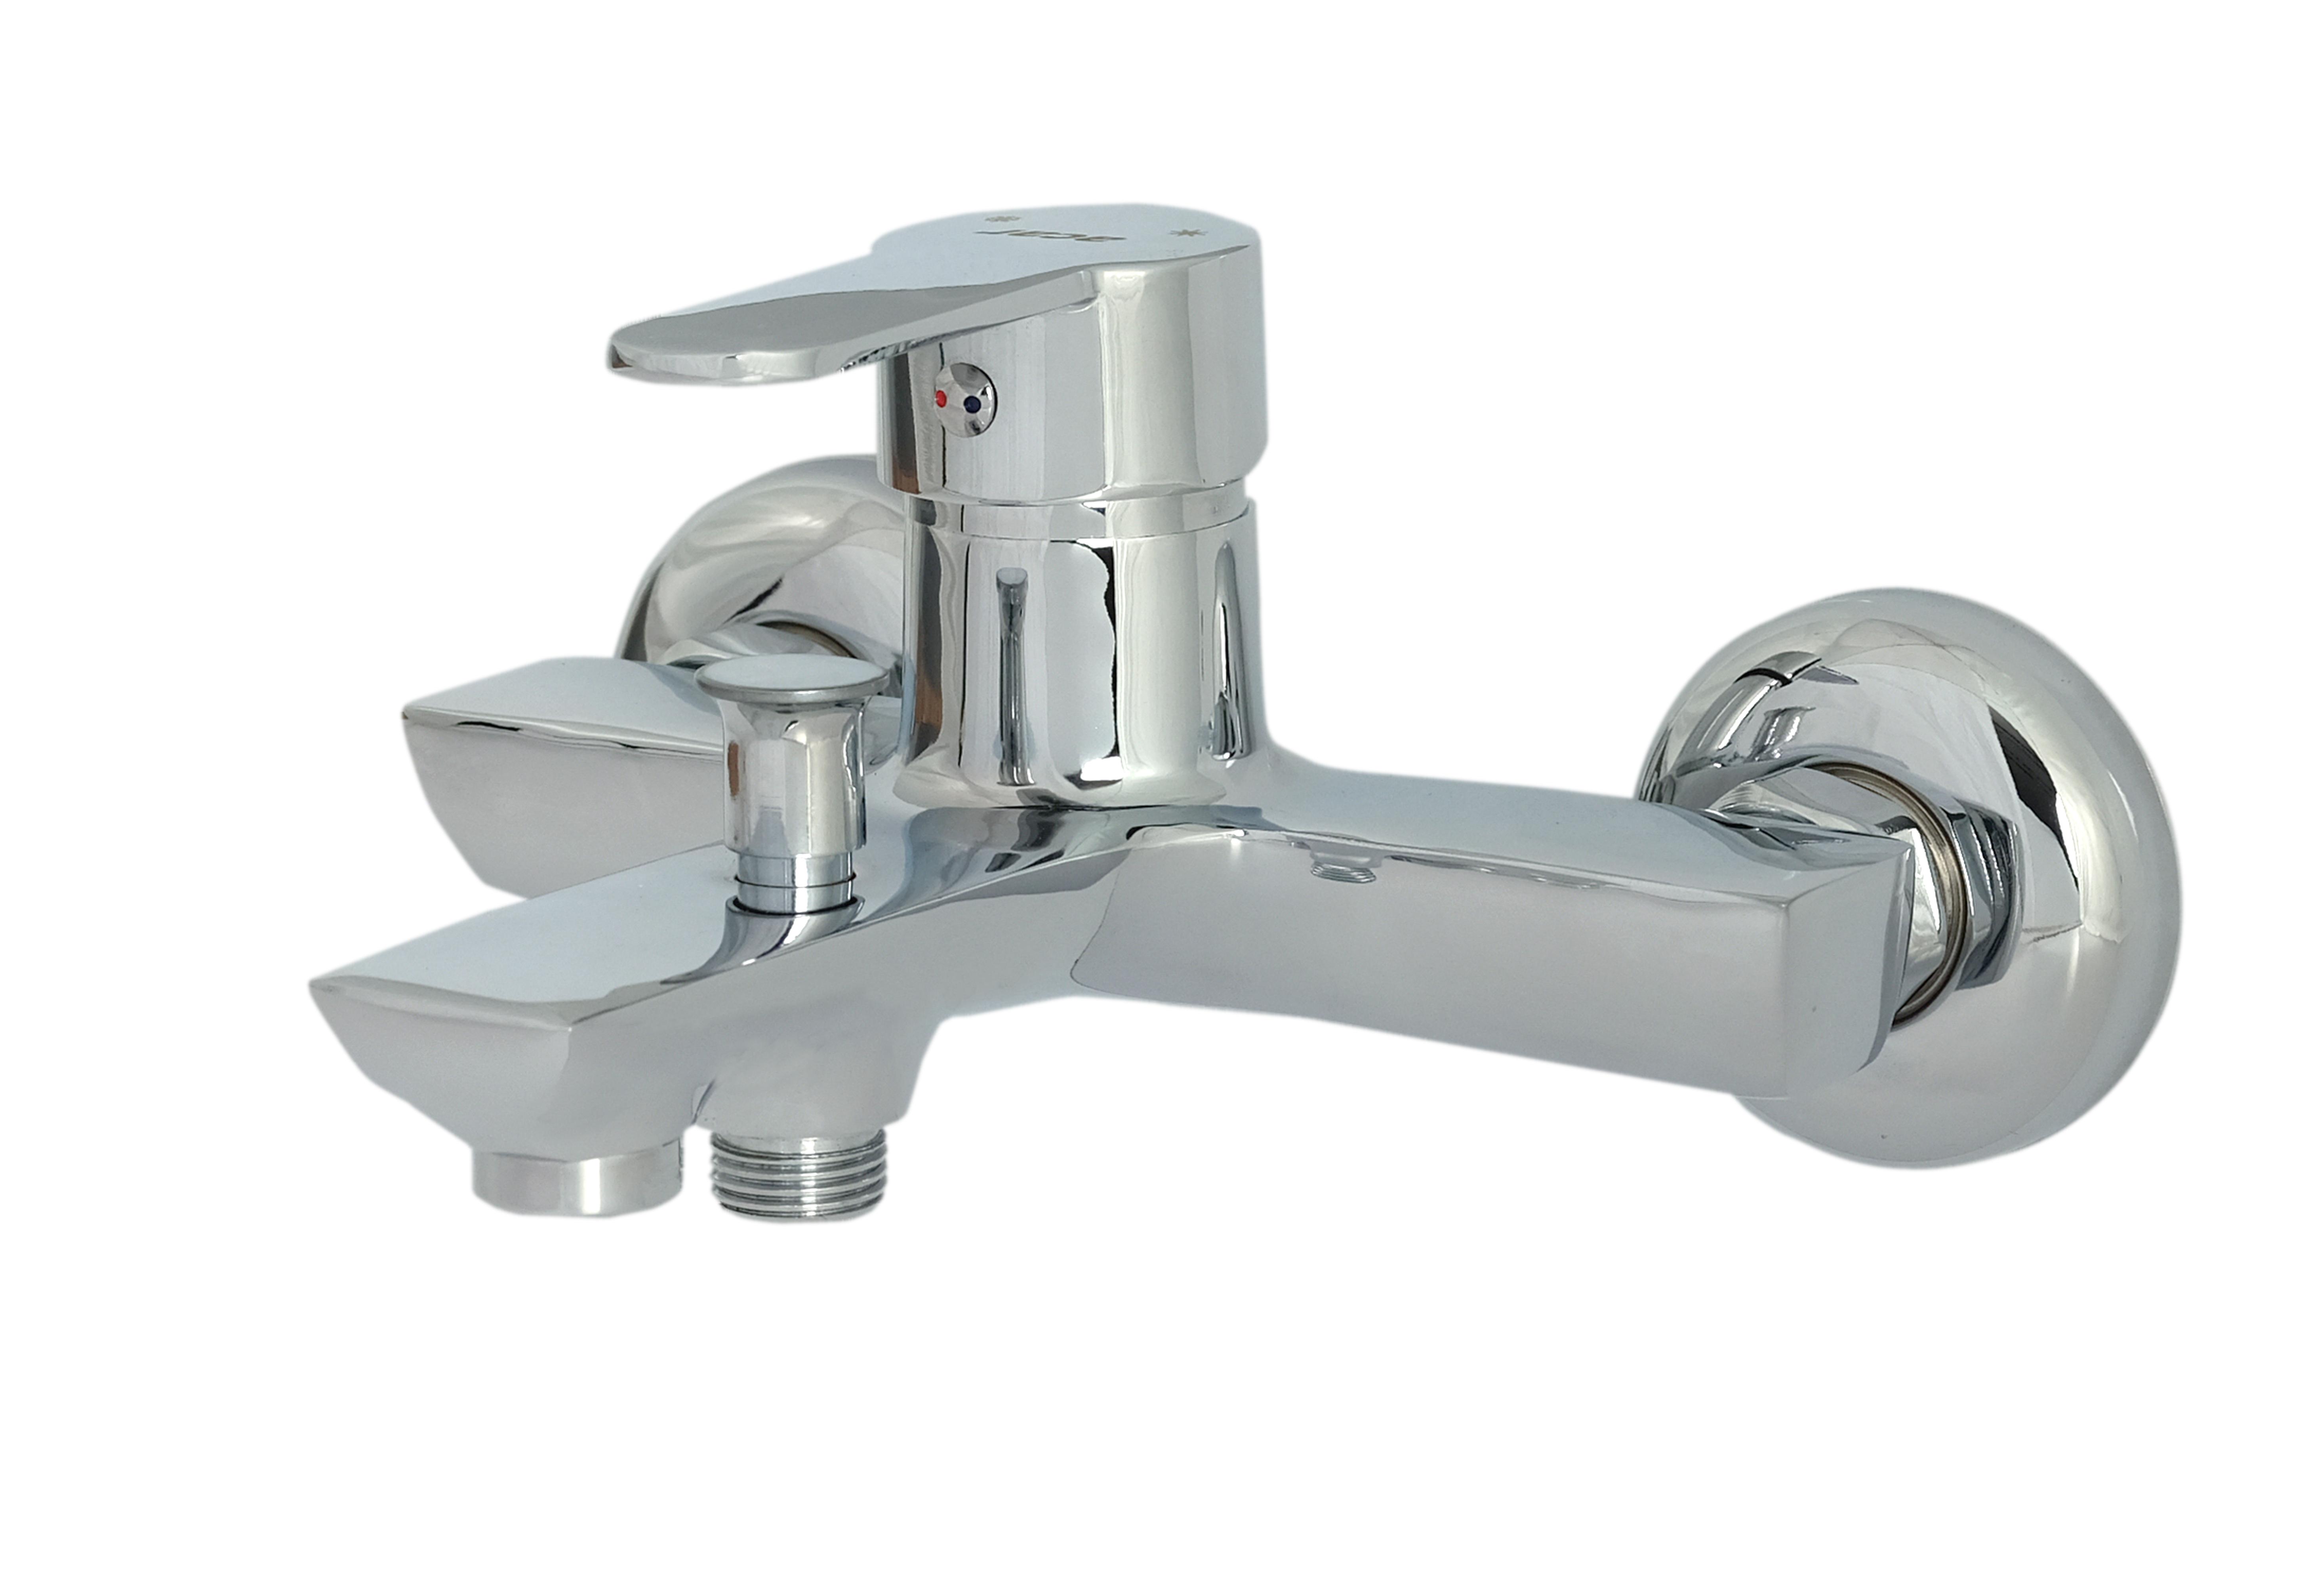 Lapis Series Bathroom & Basin Faucet